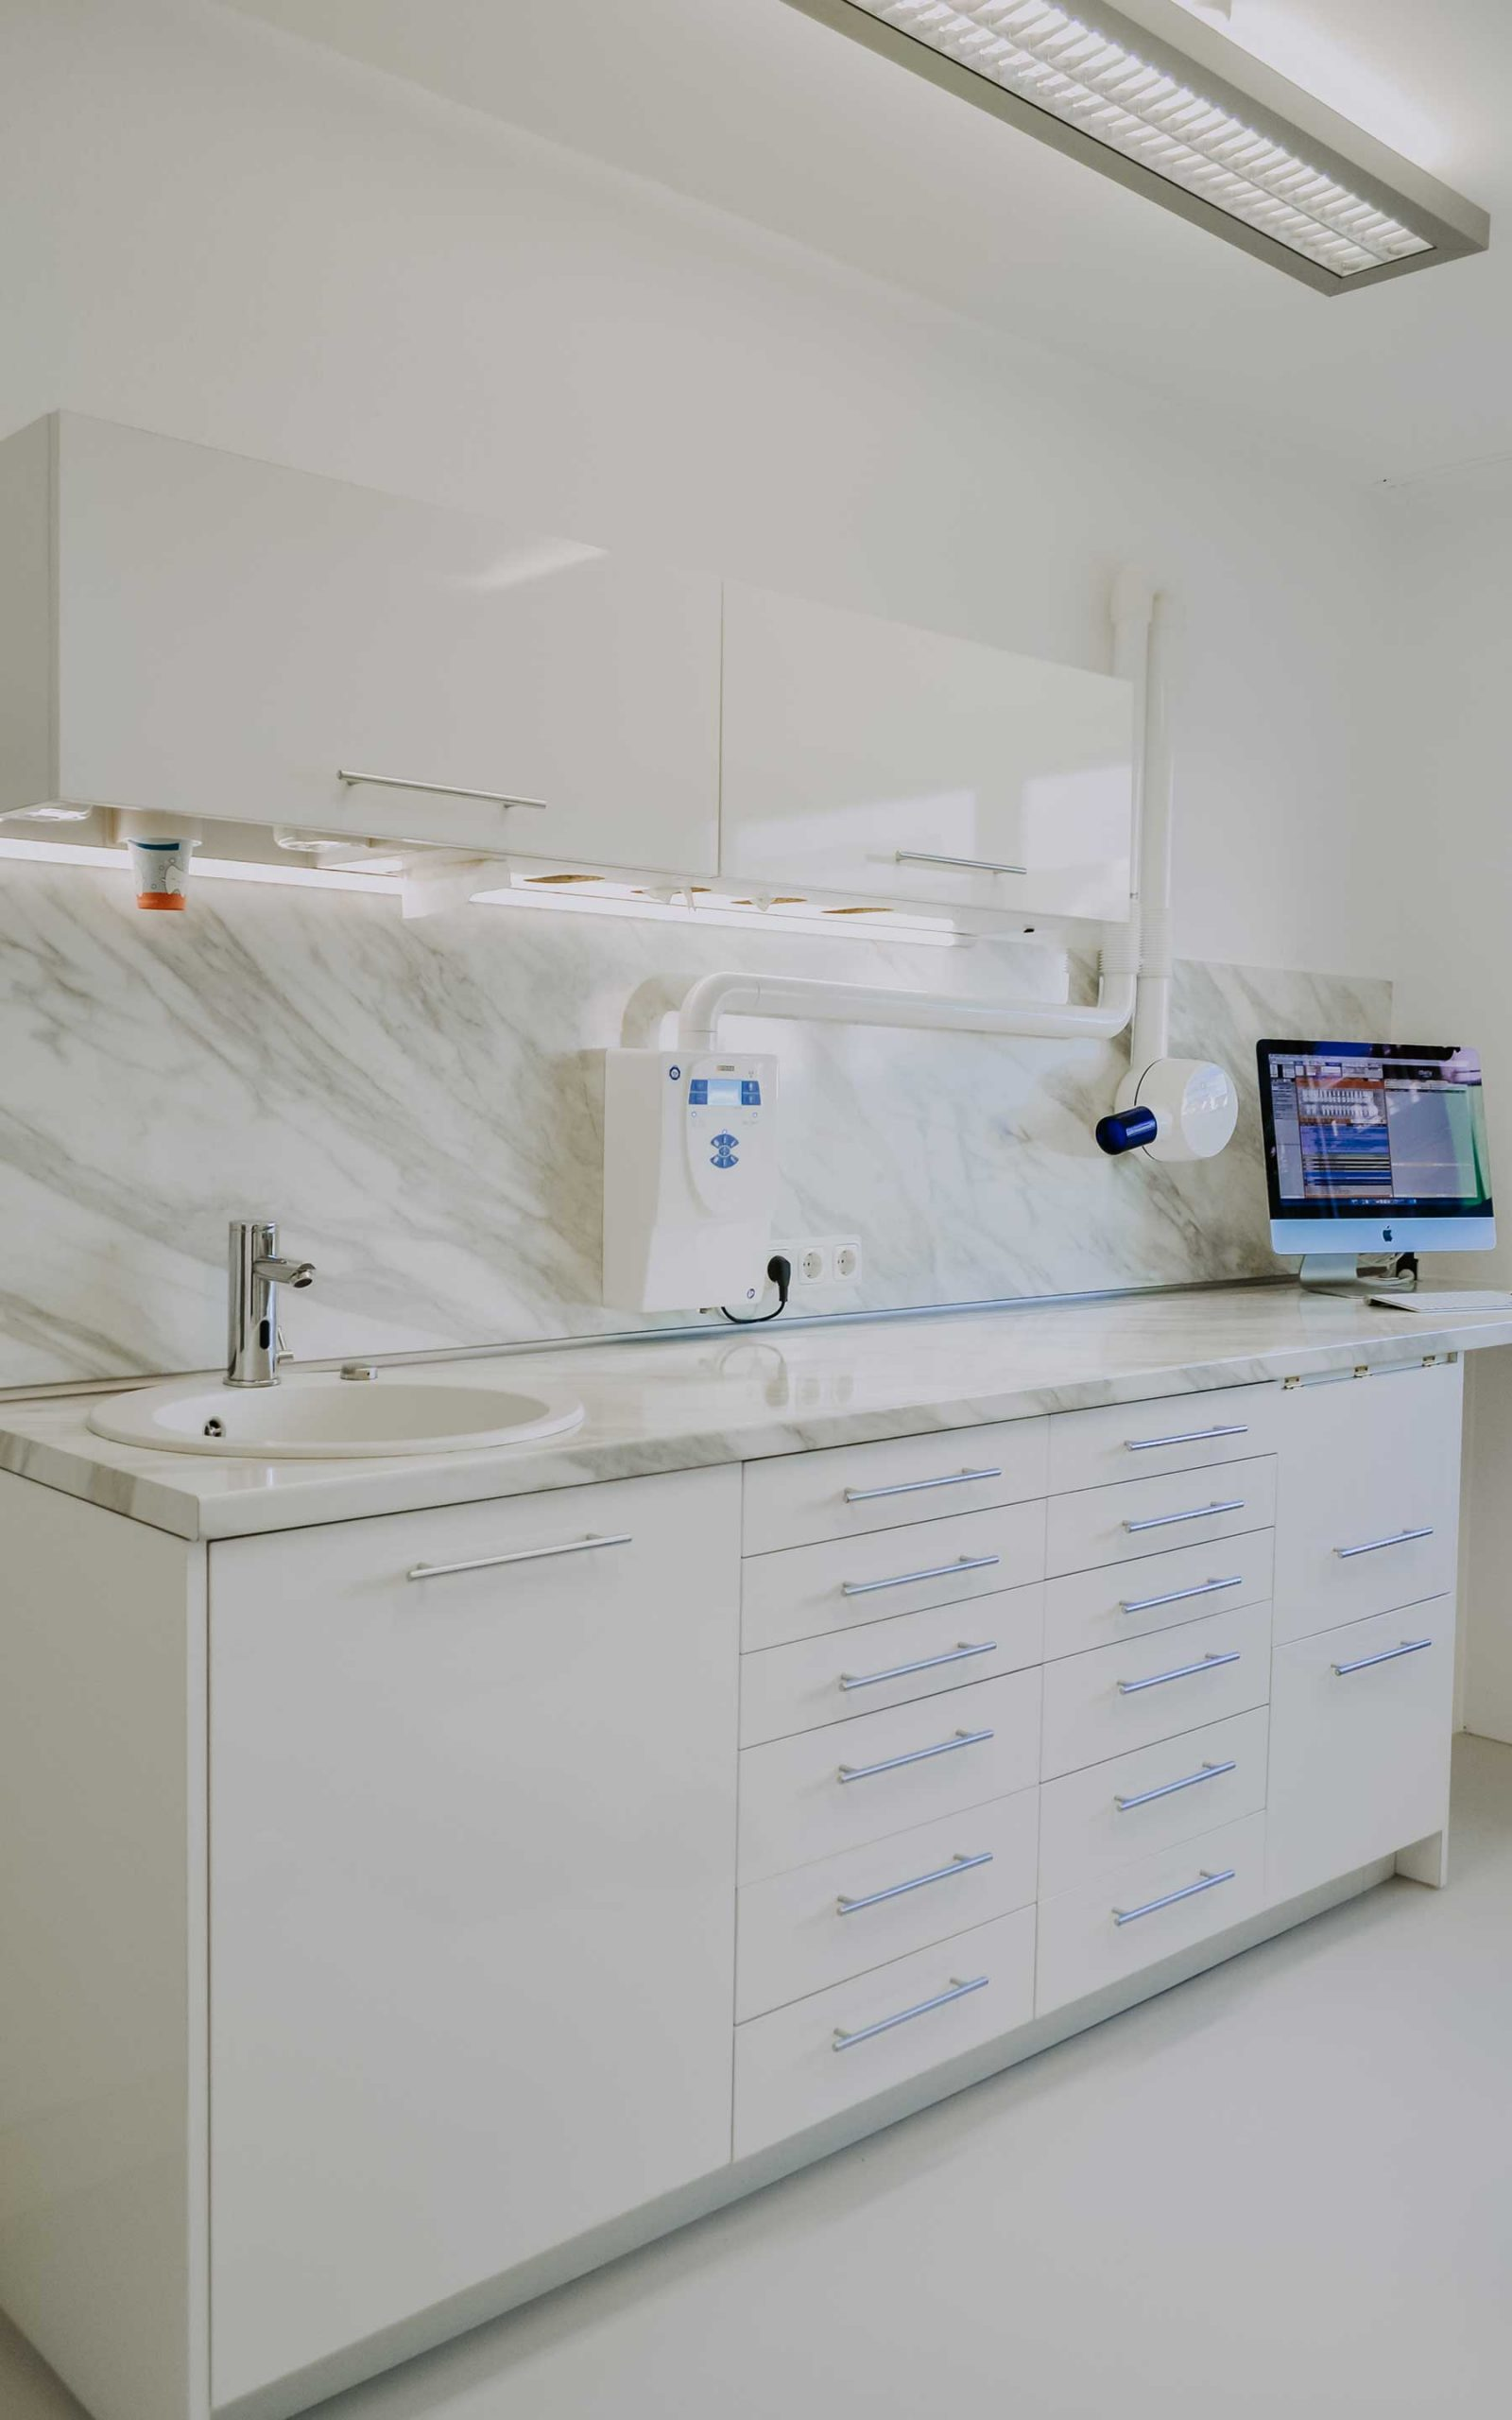 Zahnarztpraxis Barbutova Behandlungsraum Arbeitsbereich